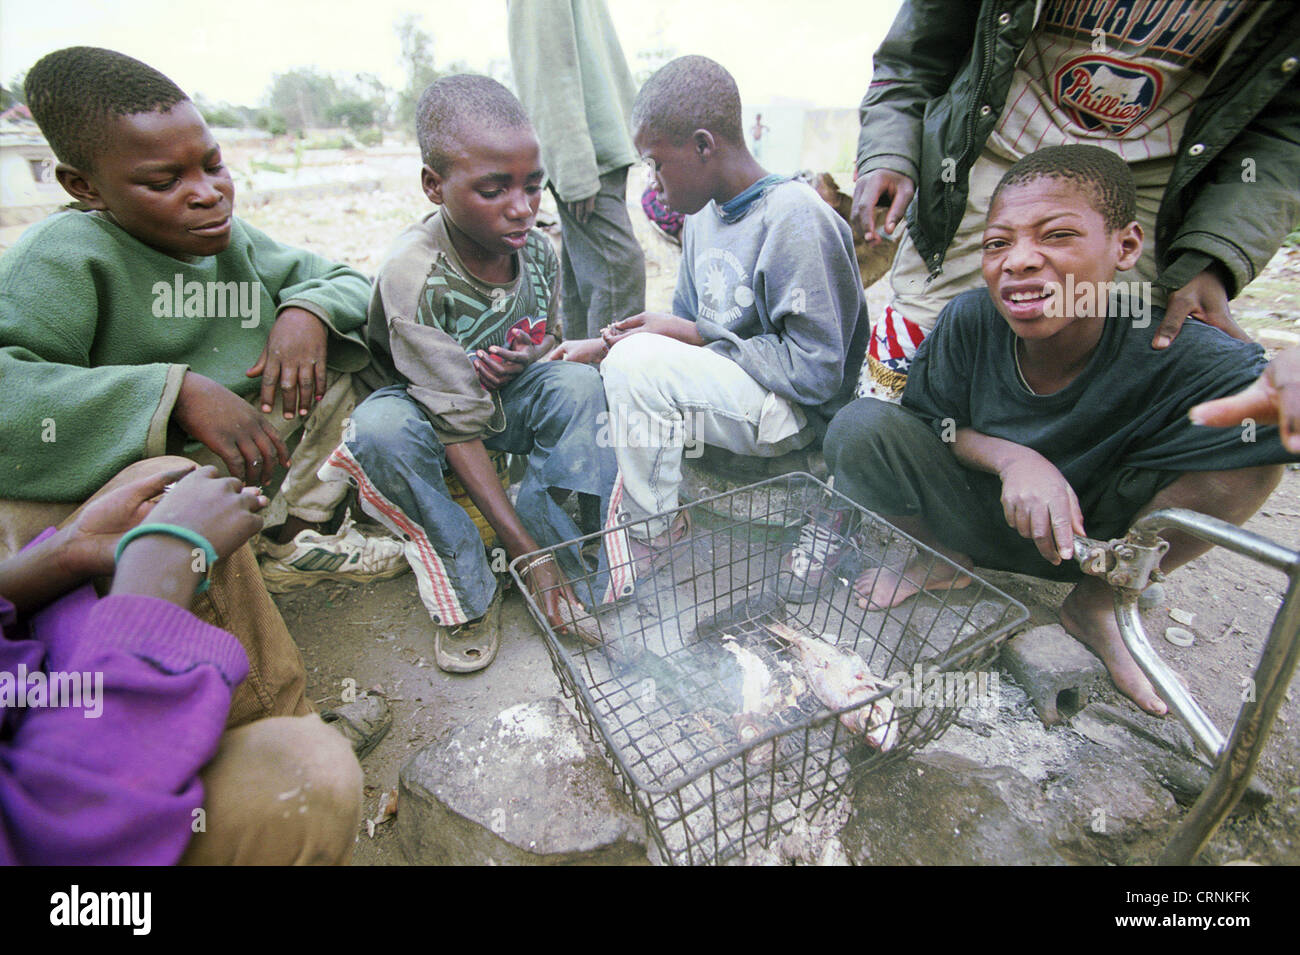 Meeting place of street children in Lubango. - Stock Image